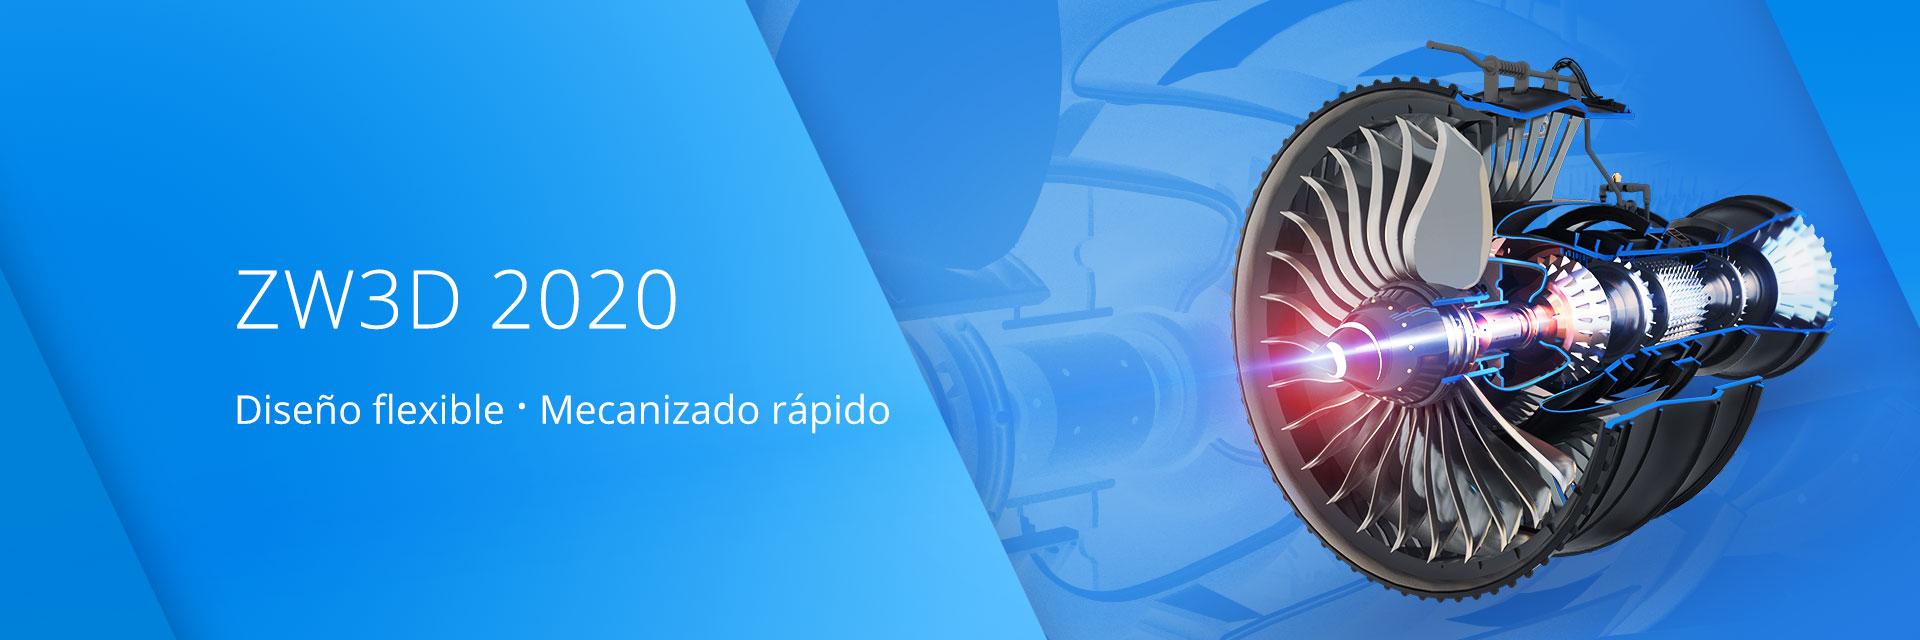 ZW3D-2020-Banner-Oficial.jpg